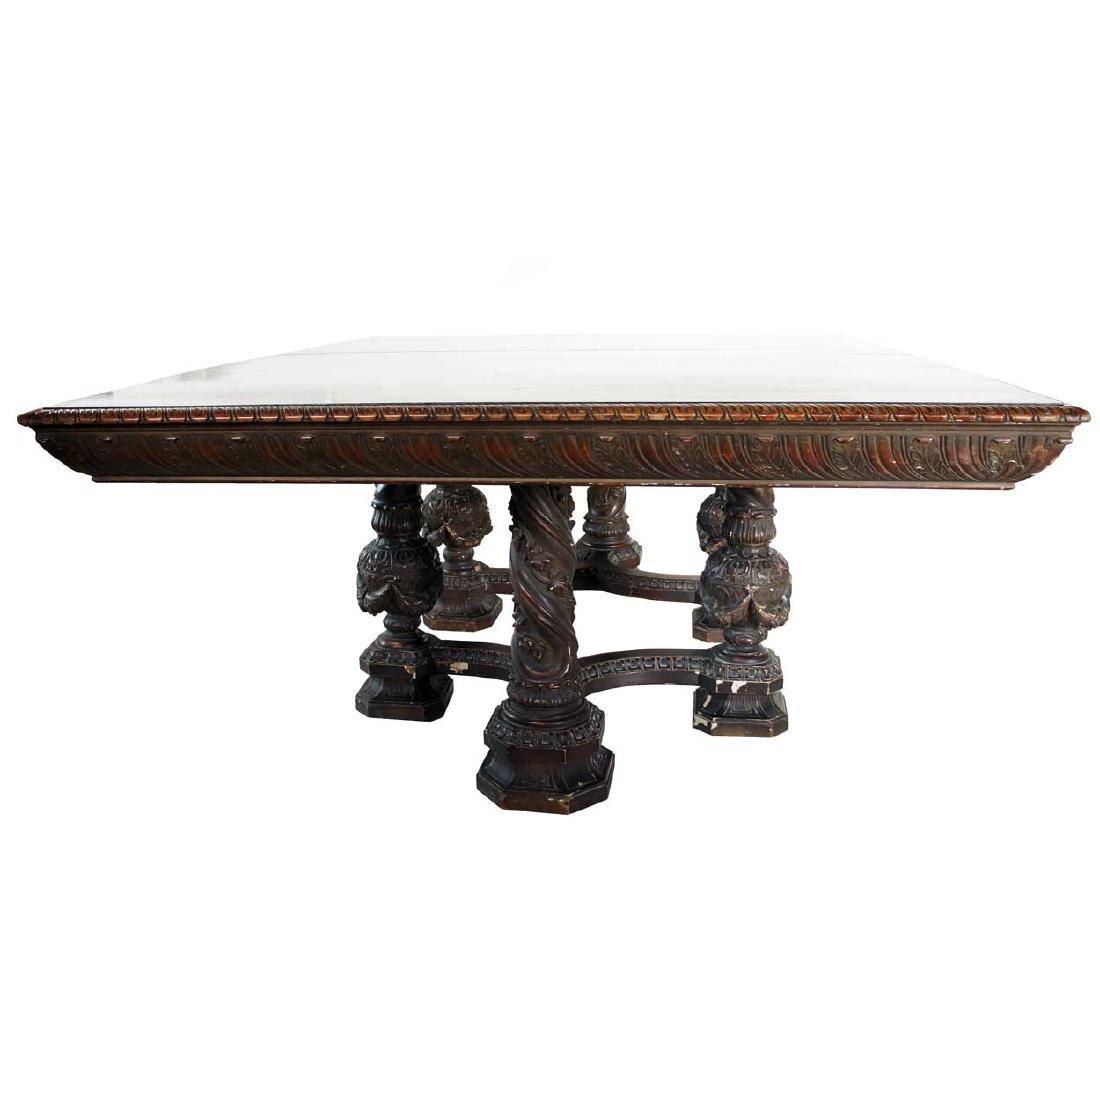 American Renaissance Revival Oak Extending Dining Table